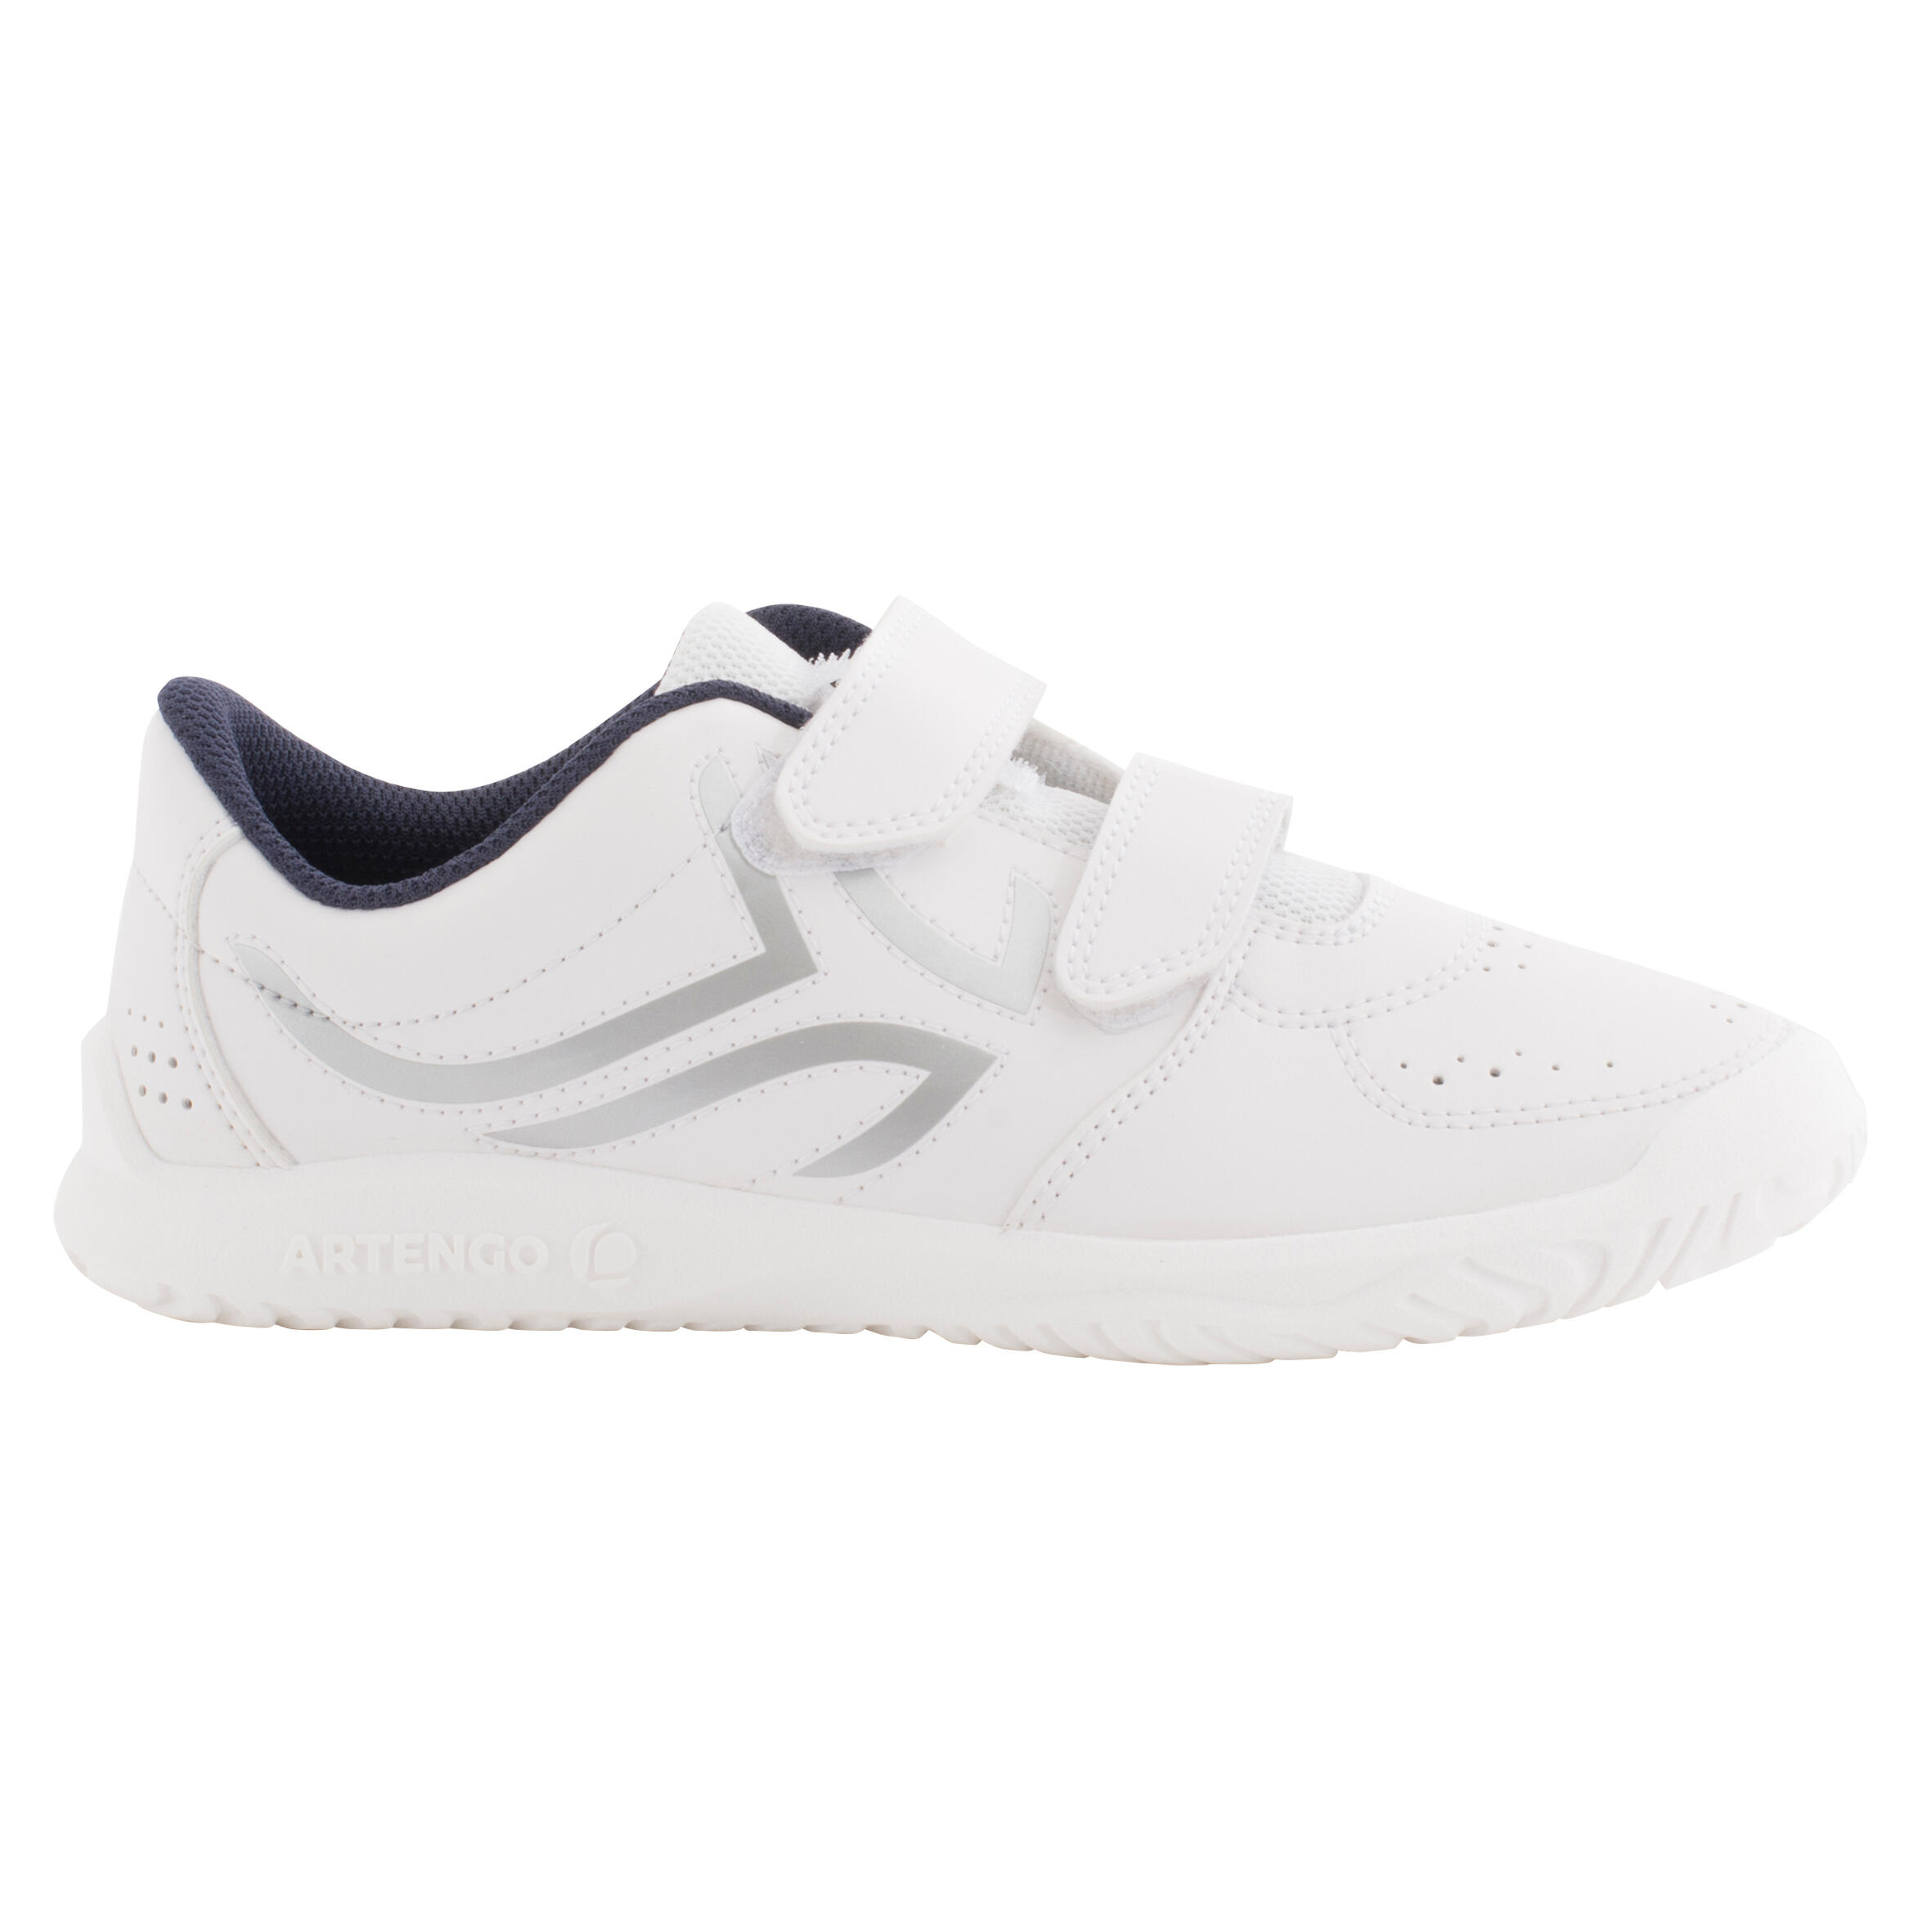 TS100 Grip Kids Tennis Shoes - White/Blue